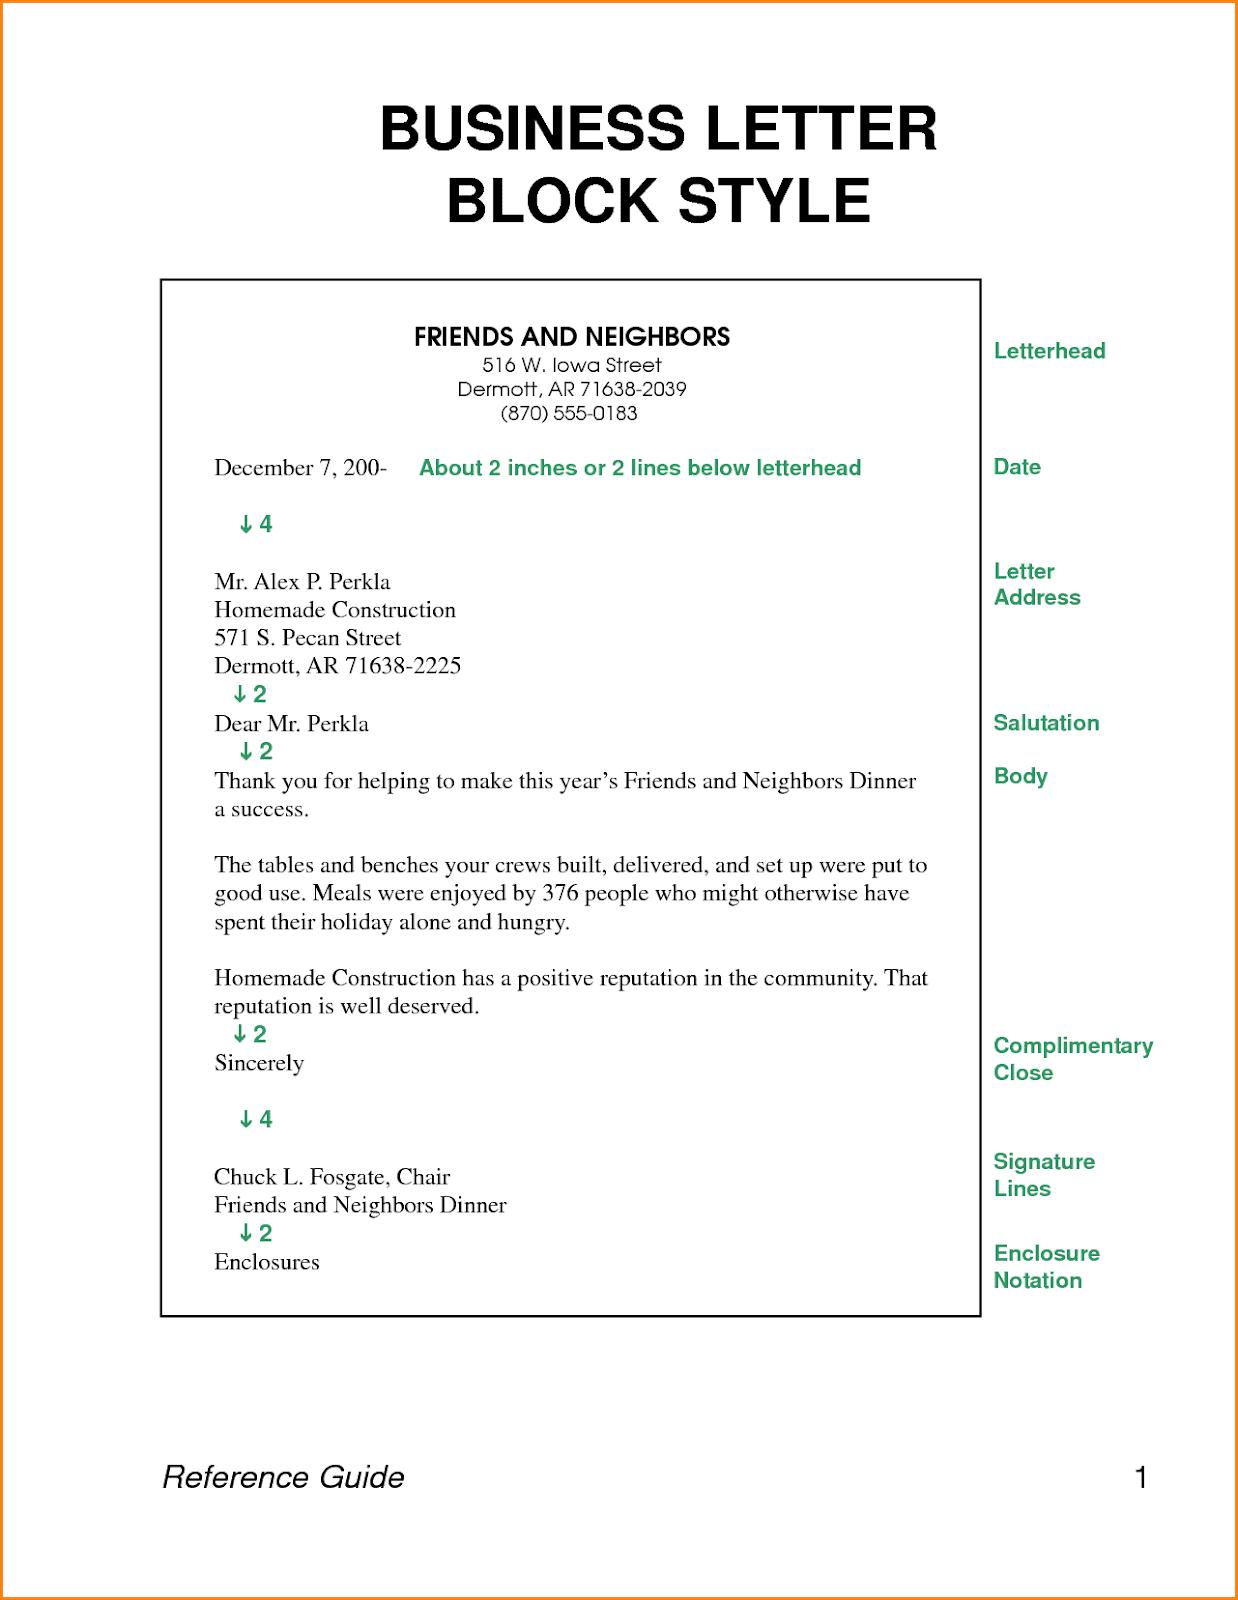 Format A Business Letter from 1.bp.blogspot.com